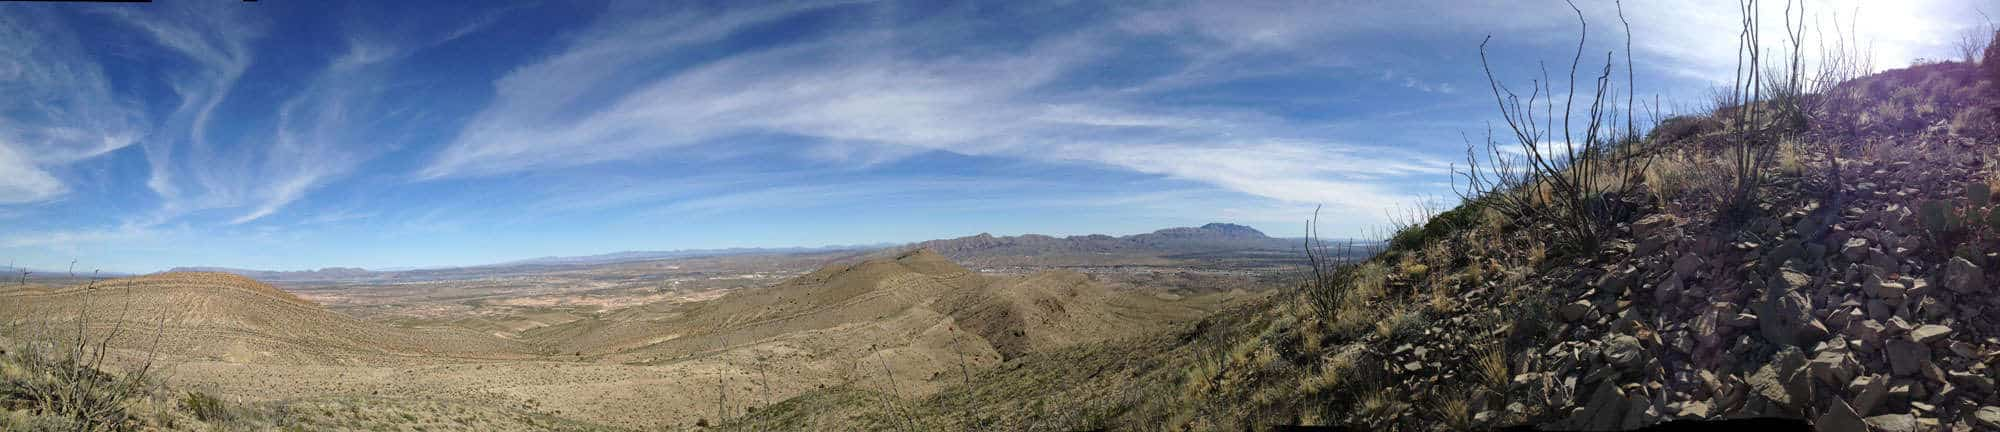 Mud Mountain hike